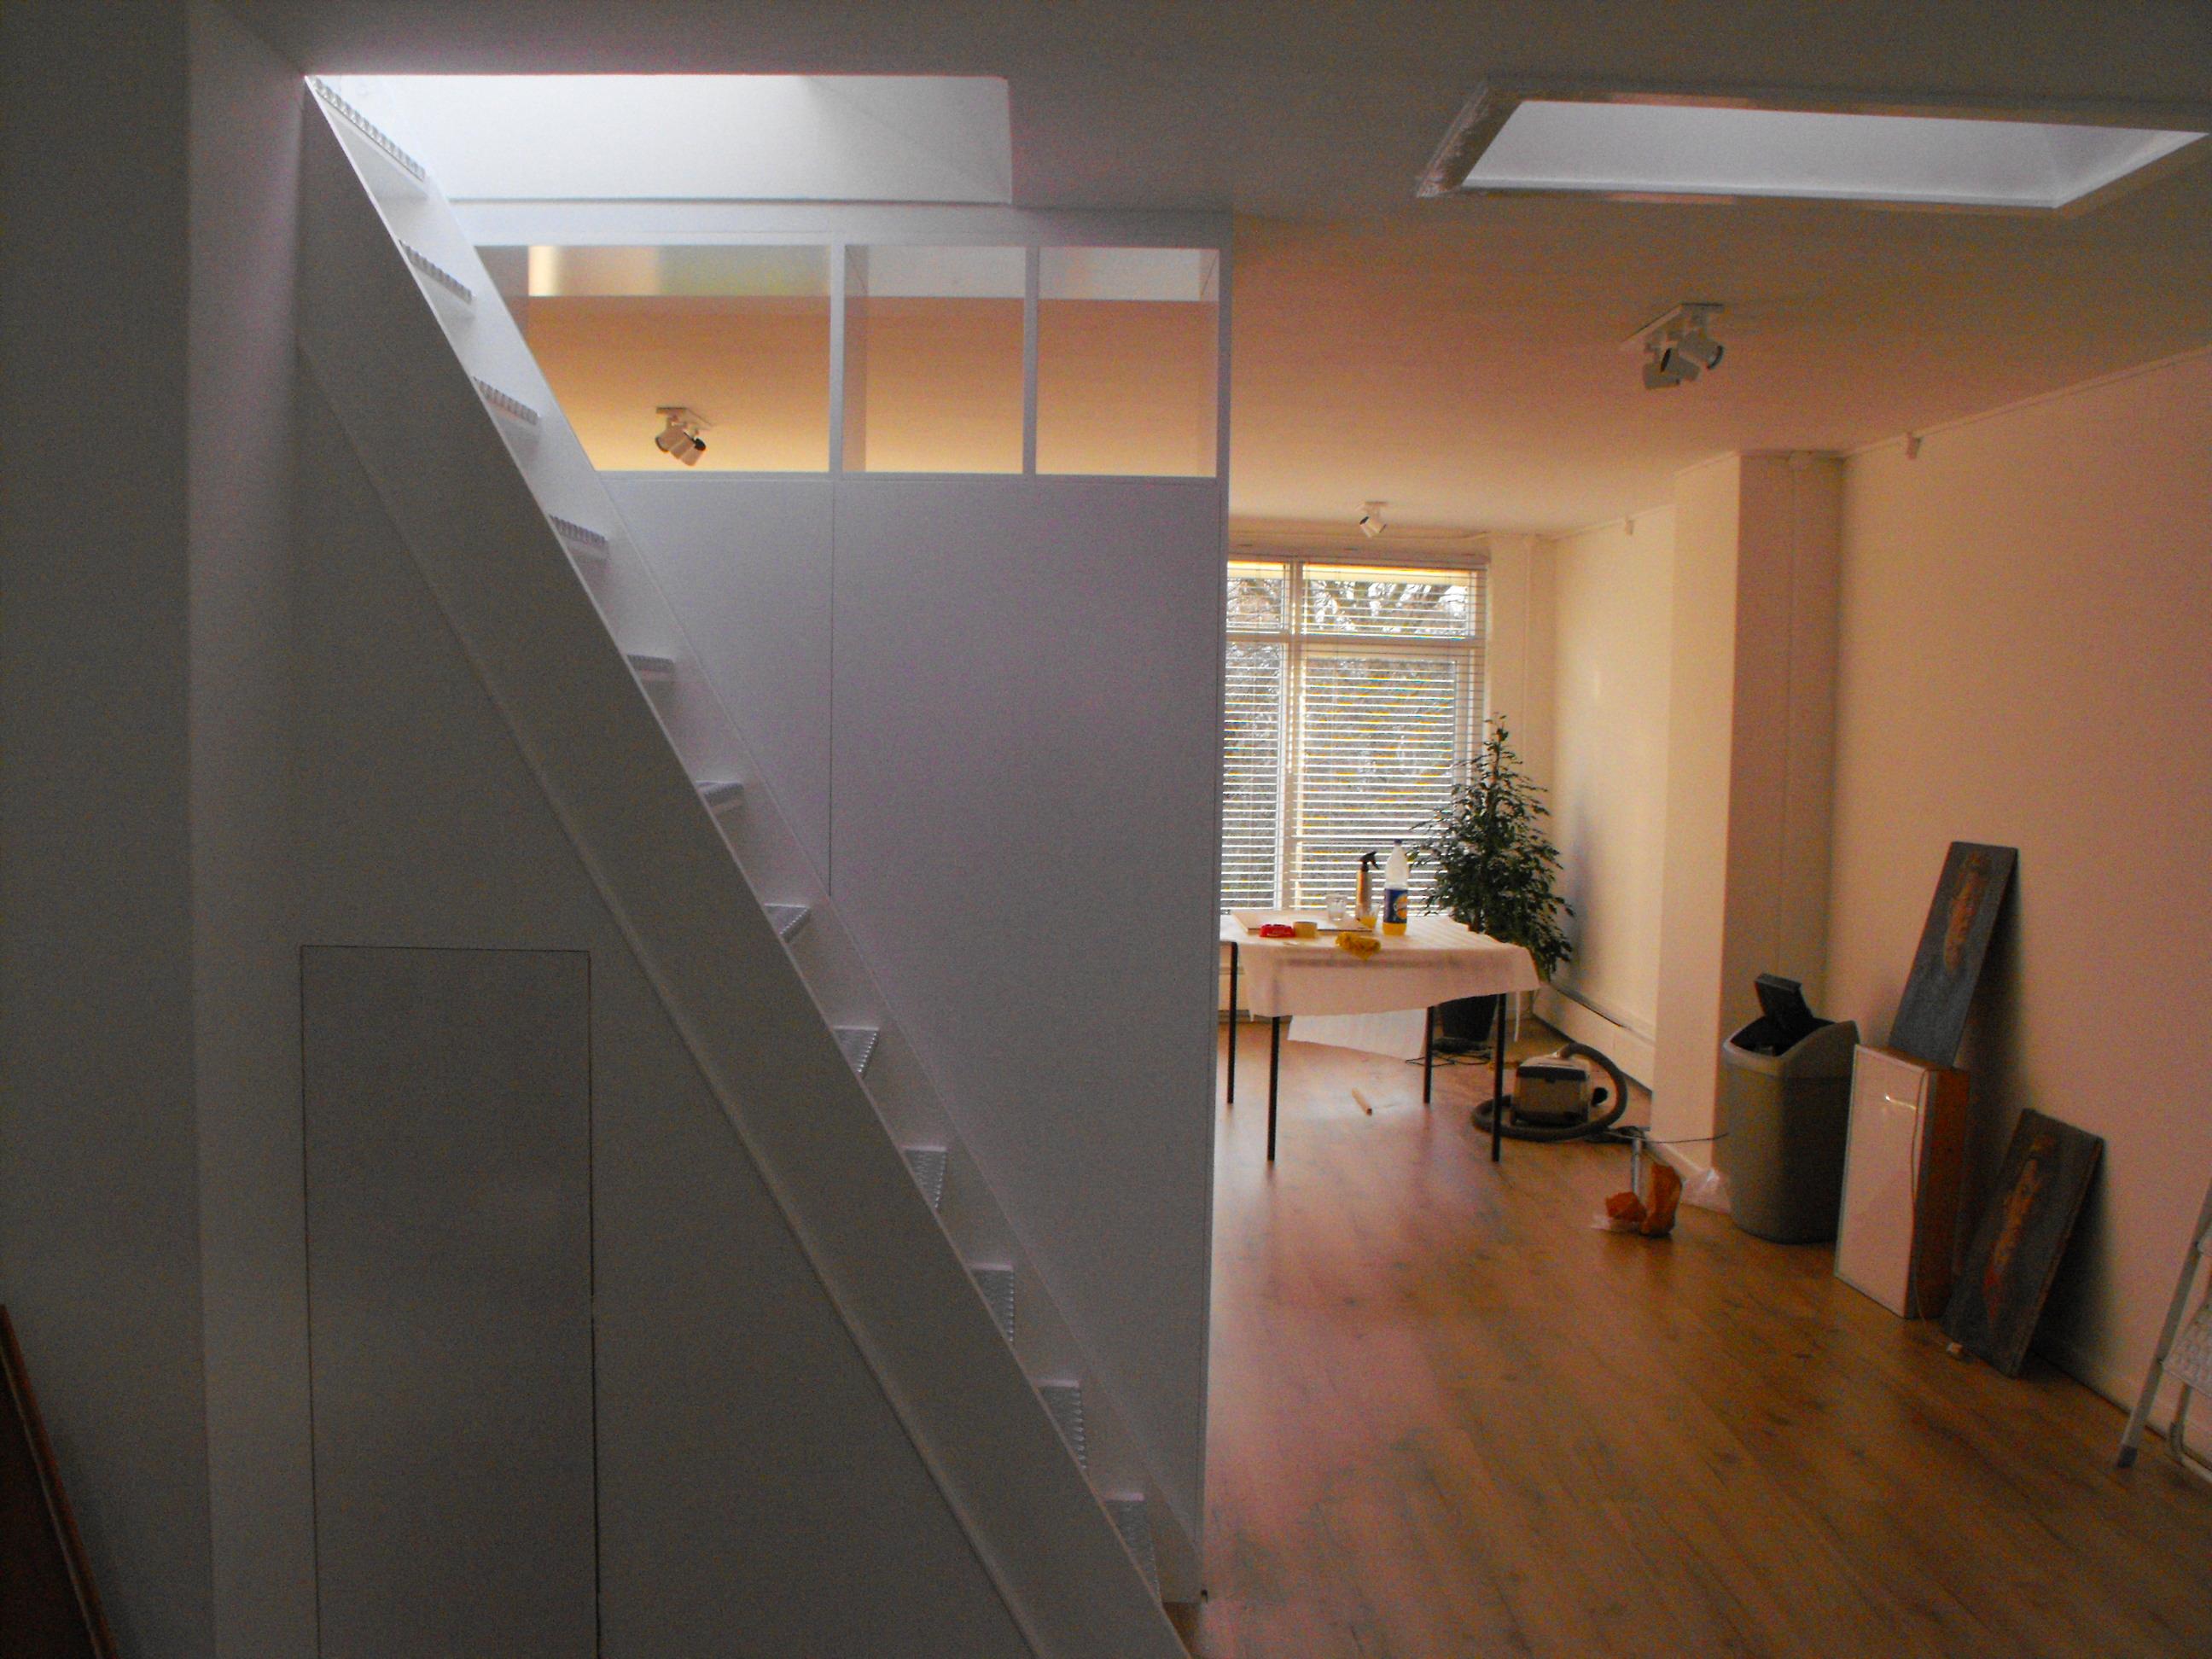 Alain design projecten alain design interieur architectuur en lichtmontage - Meubelontwerp ...